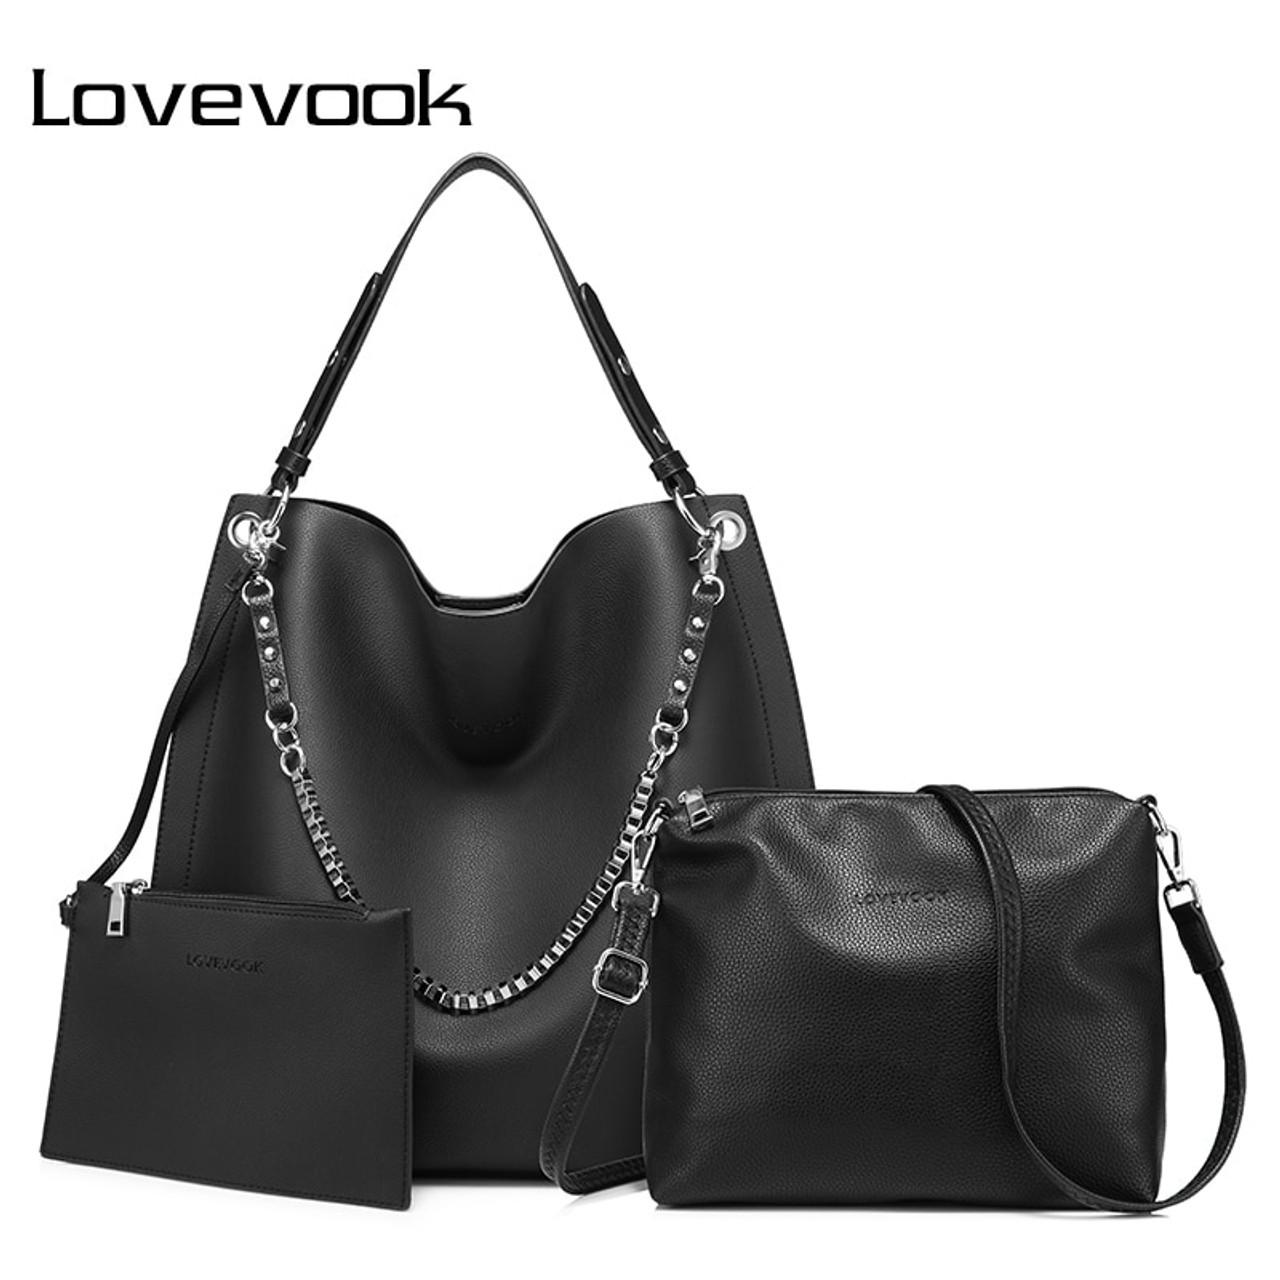 9912be104eda LOVEVOOK 3 set women handbag large tote bag shoulder crossbody bag with  soft artificial leather female messenger bag small purse - OnshopDeals.Com